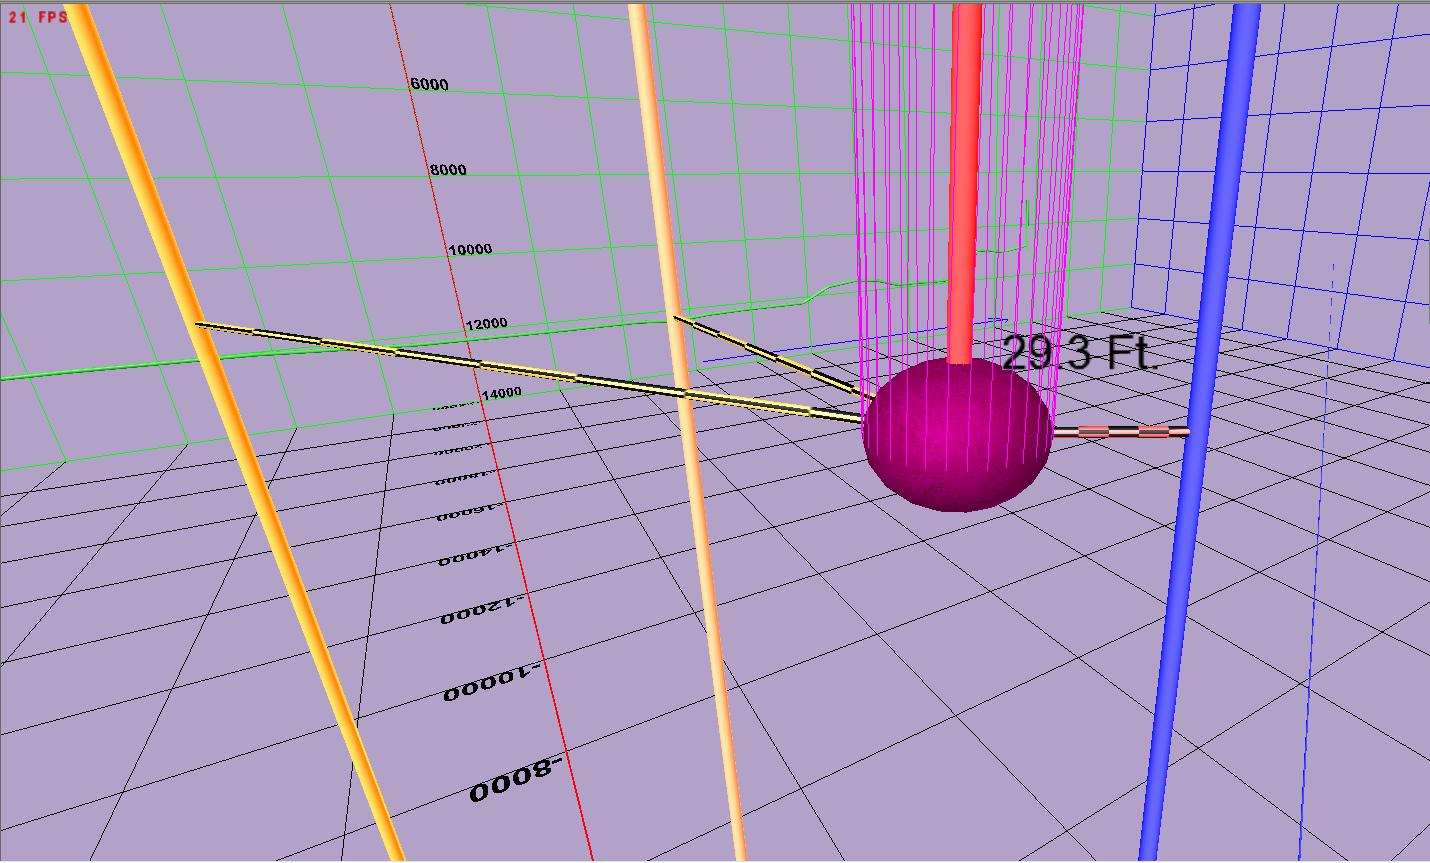 Ellipsoids of uncertainty in 3D